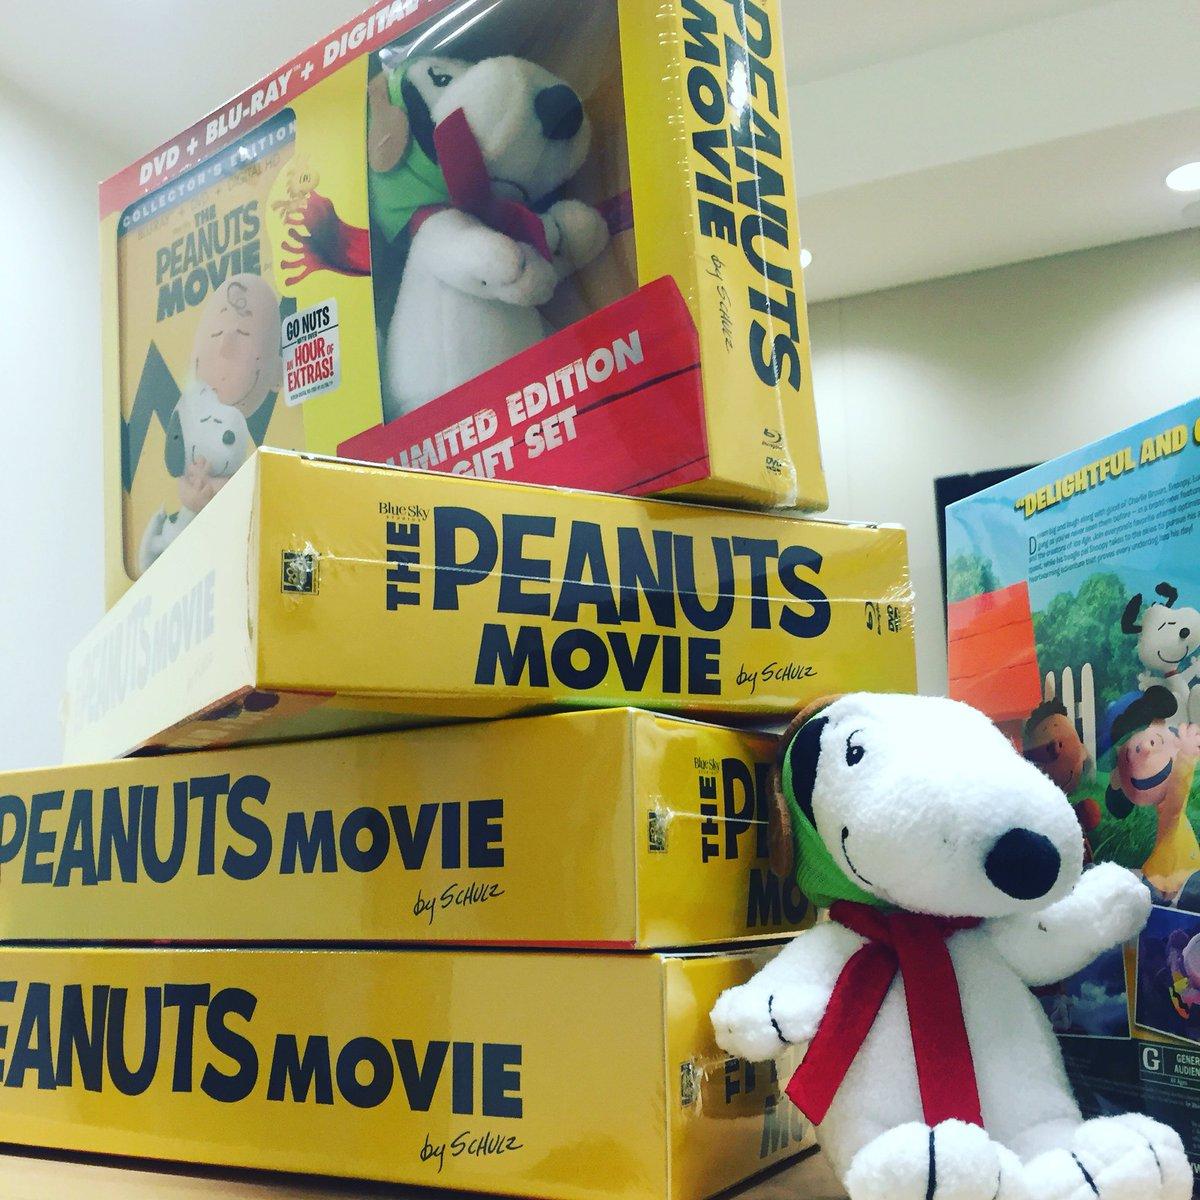 IT'S HERE! The @PeanutsMovie DVD! #DREAMBIG #PeanutsMovie https://t.co/Ywd4Y5CbRy